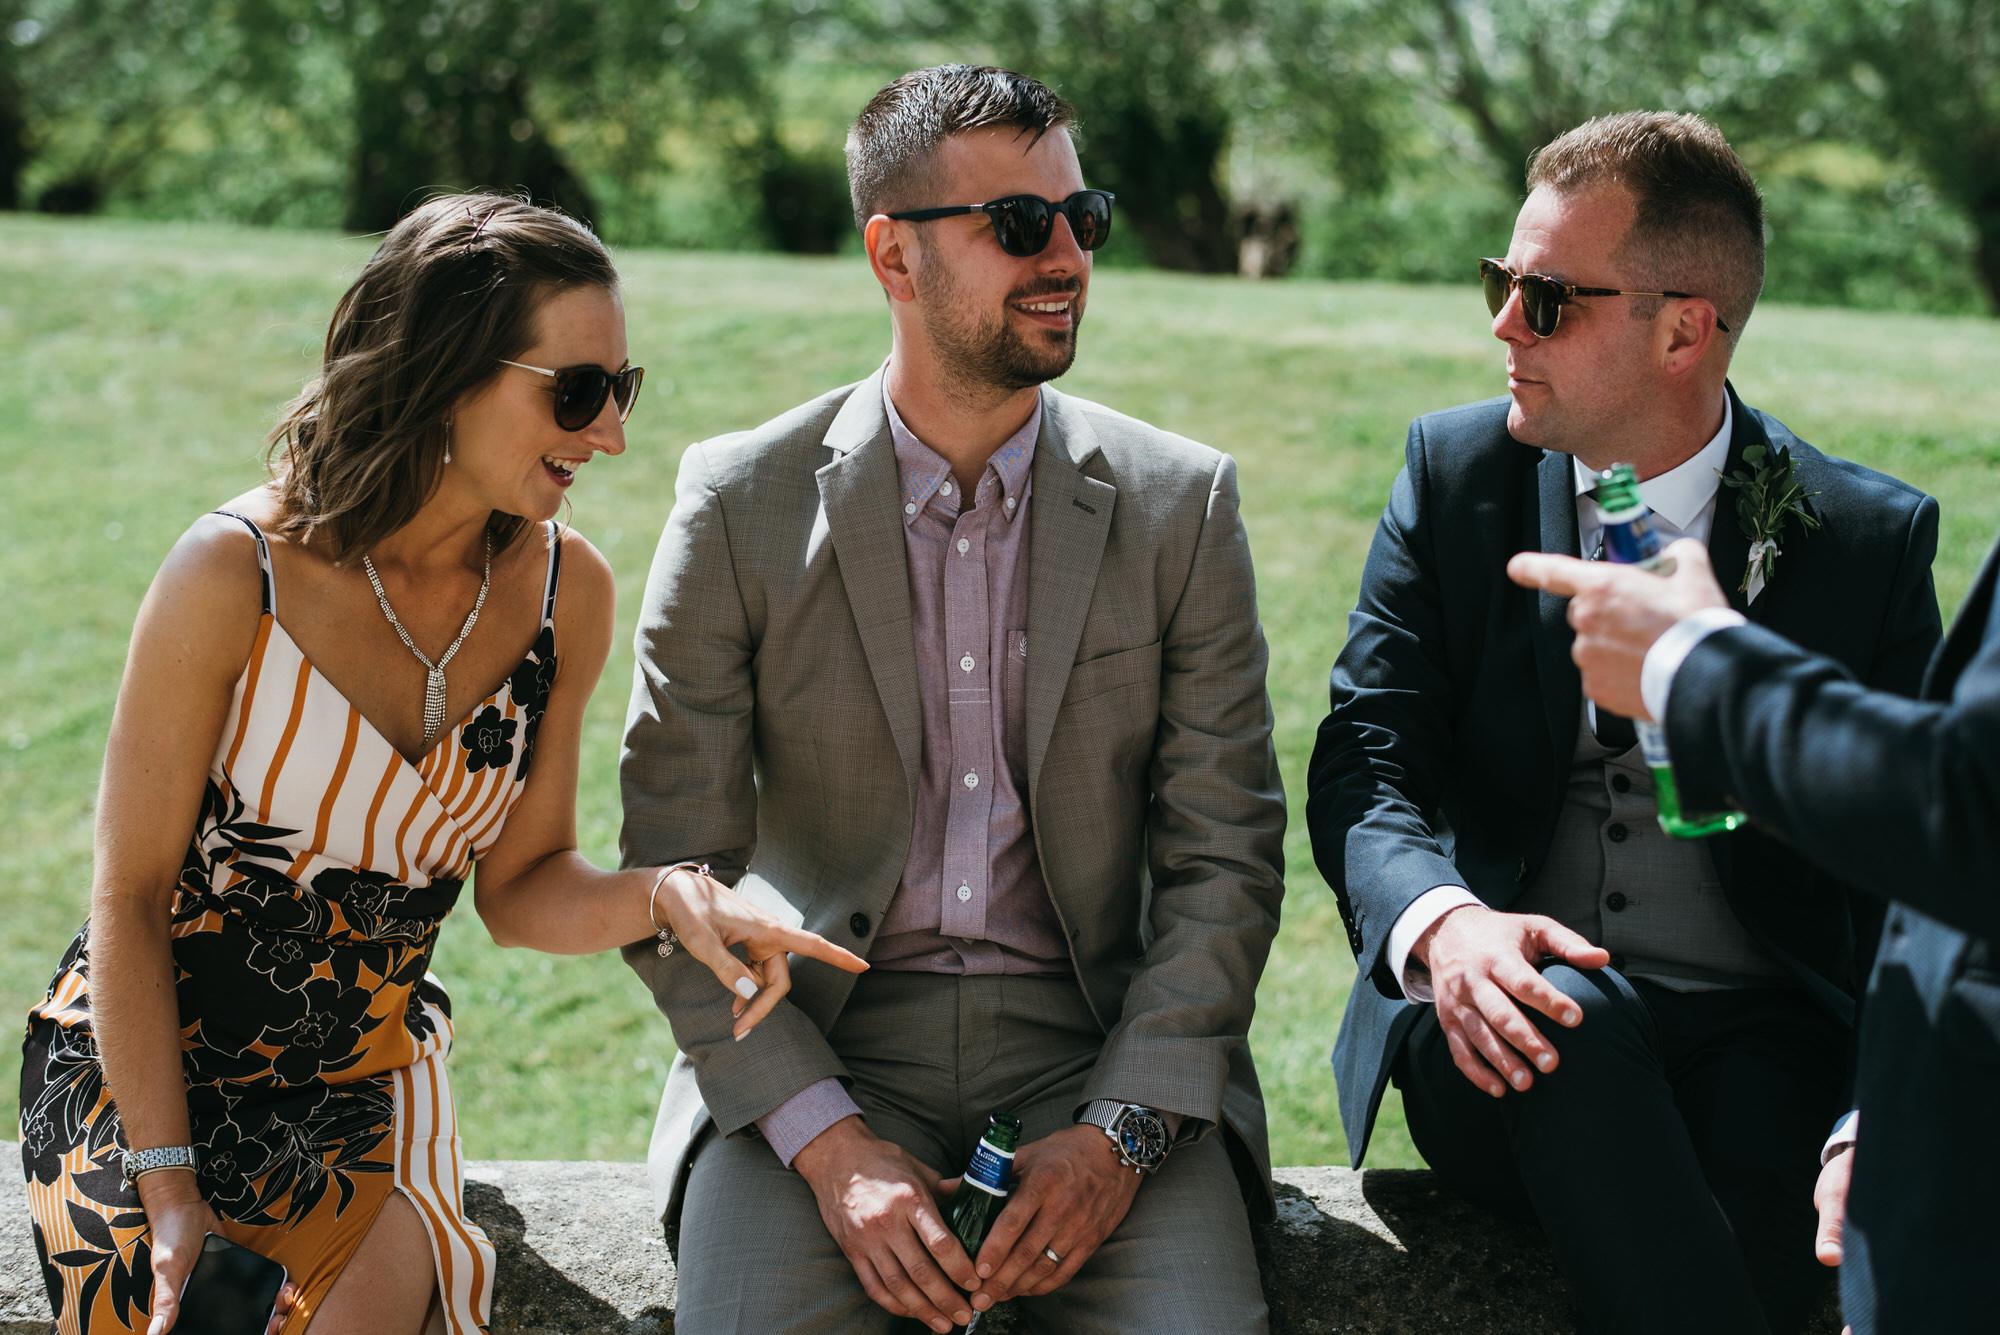 Guests enjoy wedding reception